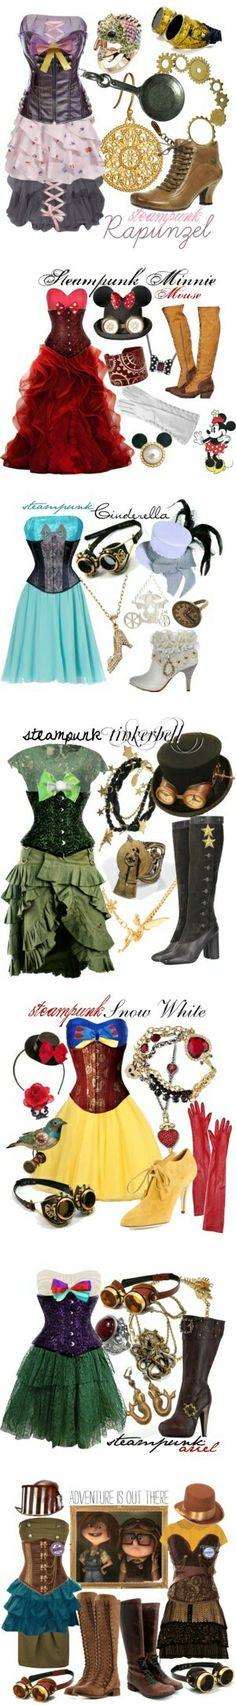 Disney princess Steampunk style